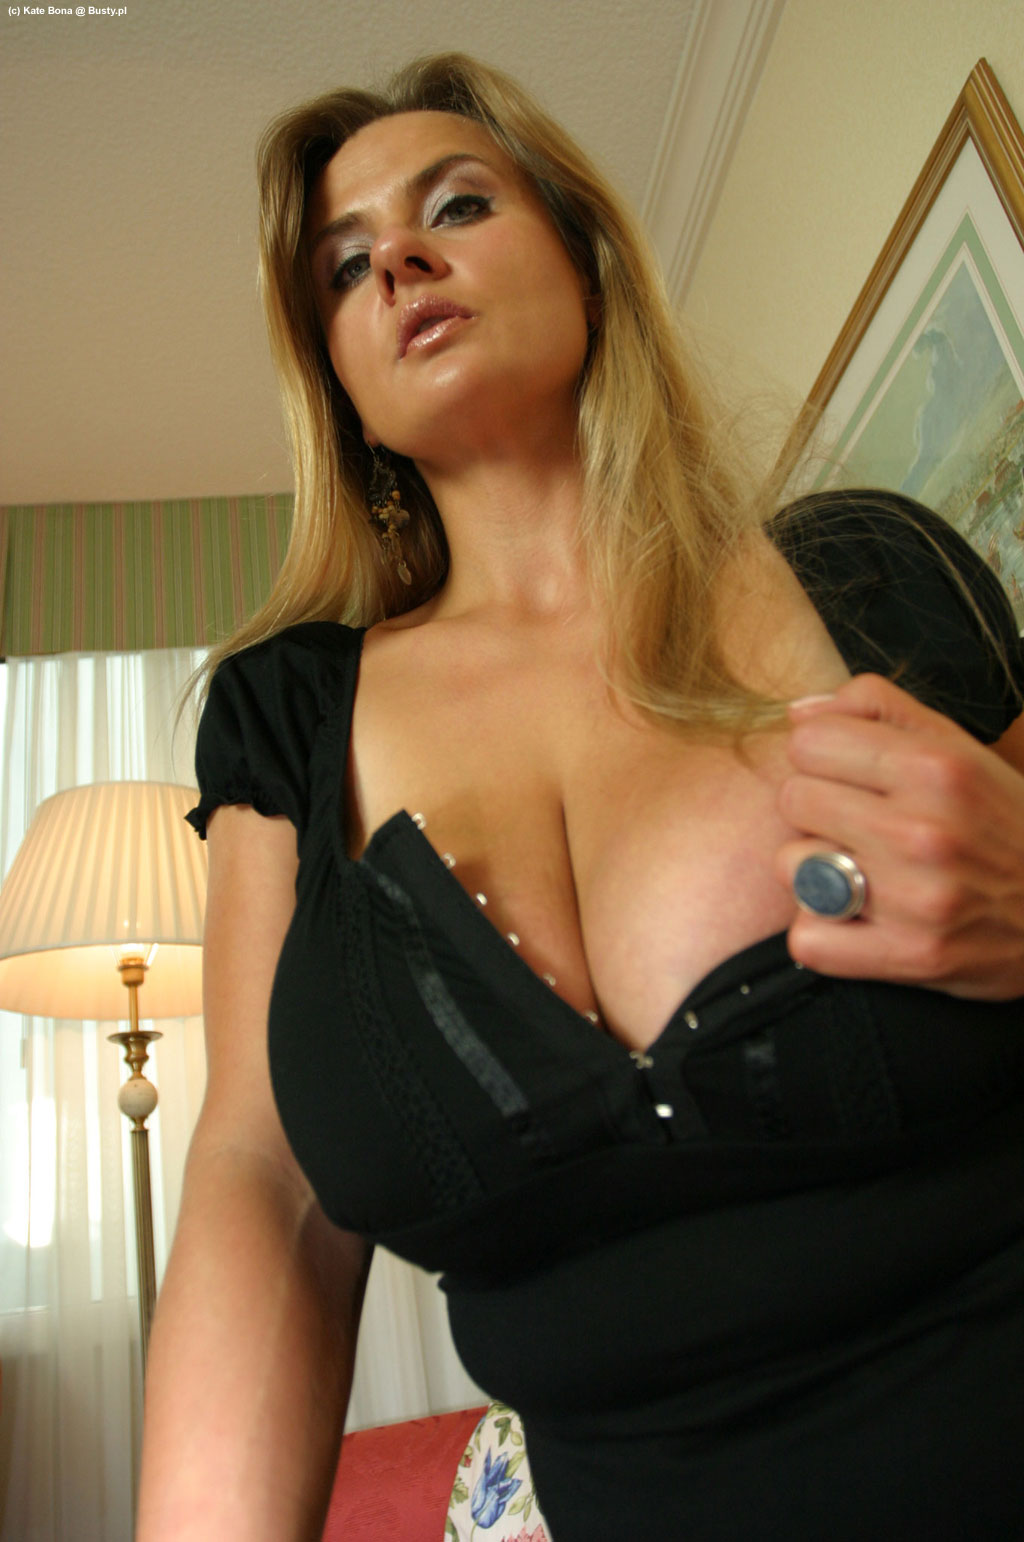 Golden Polish jumprope busty web free boobs need someone